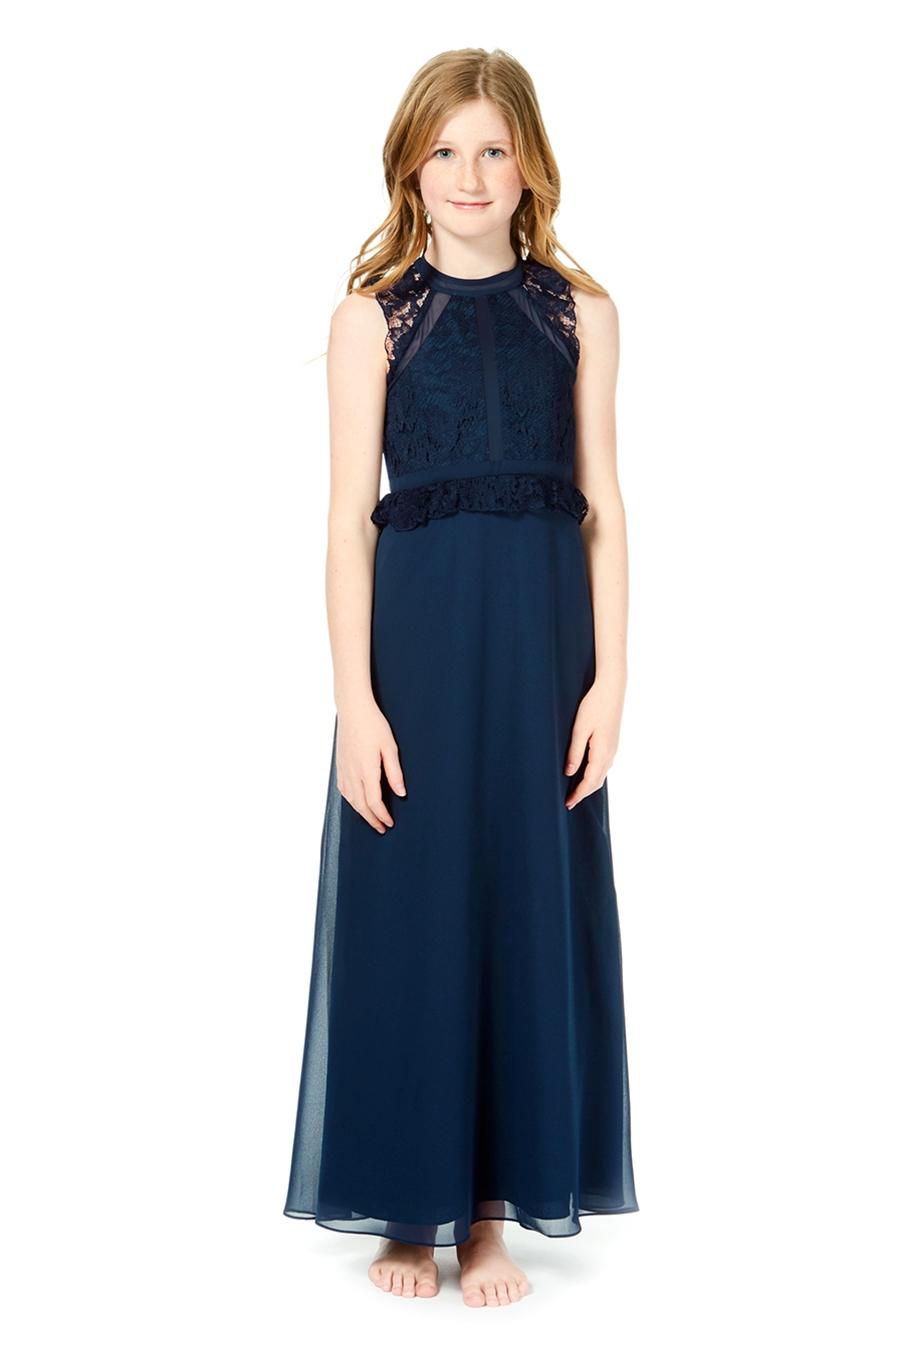 5c11770e906d Bridesmaid Dresses 2019, Buy Cheap Bridesmaid ... - Hebeos